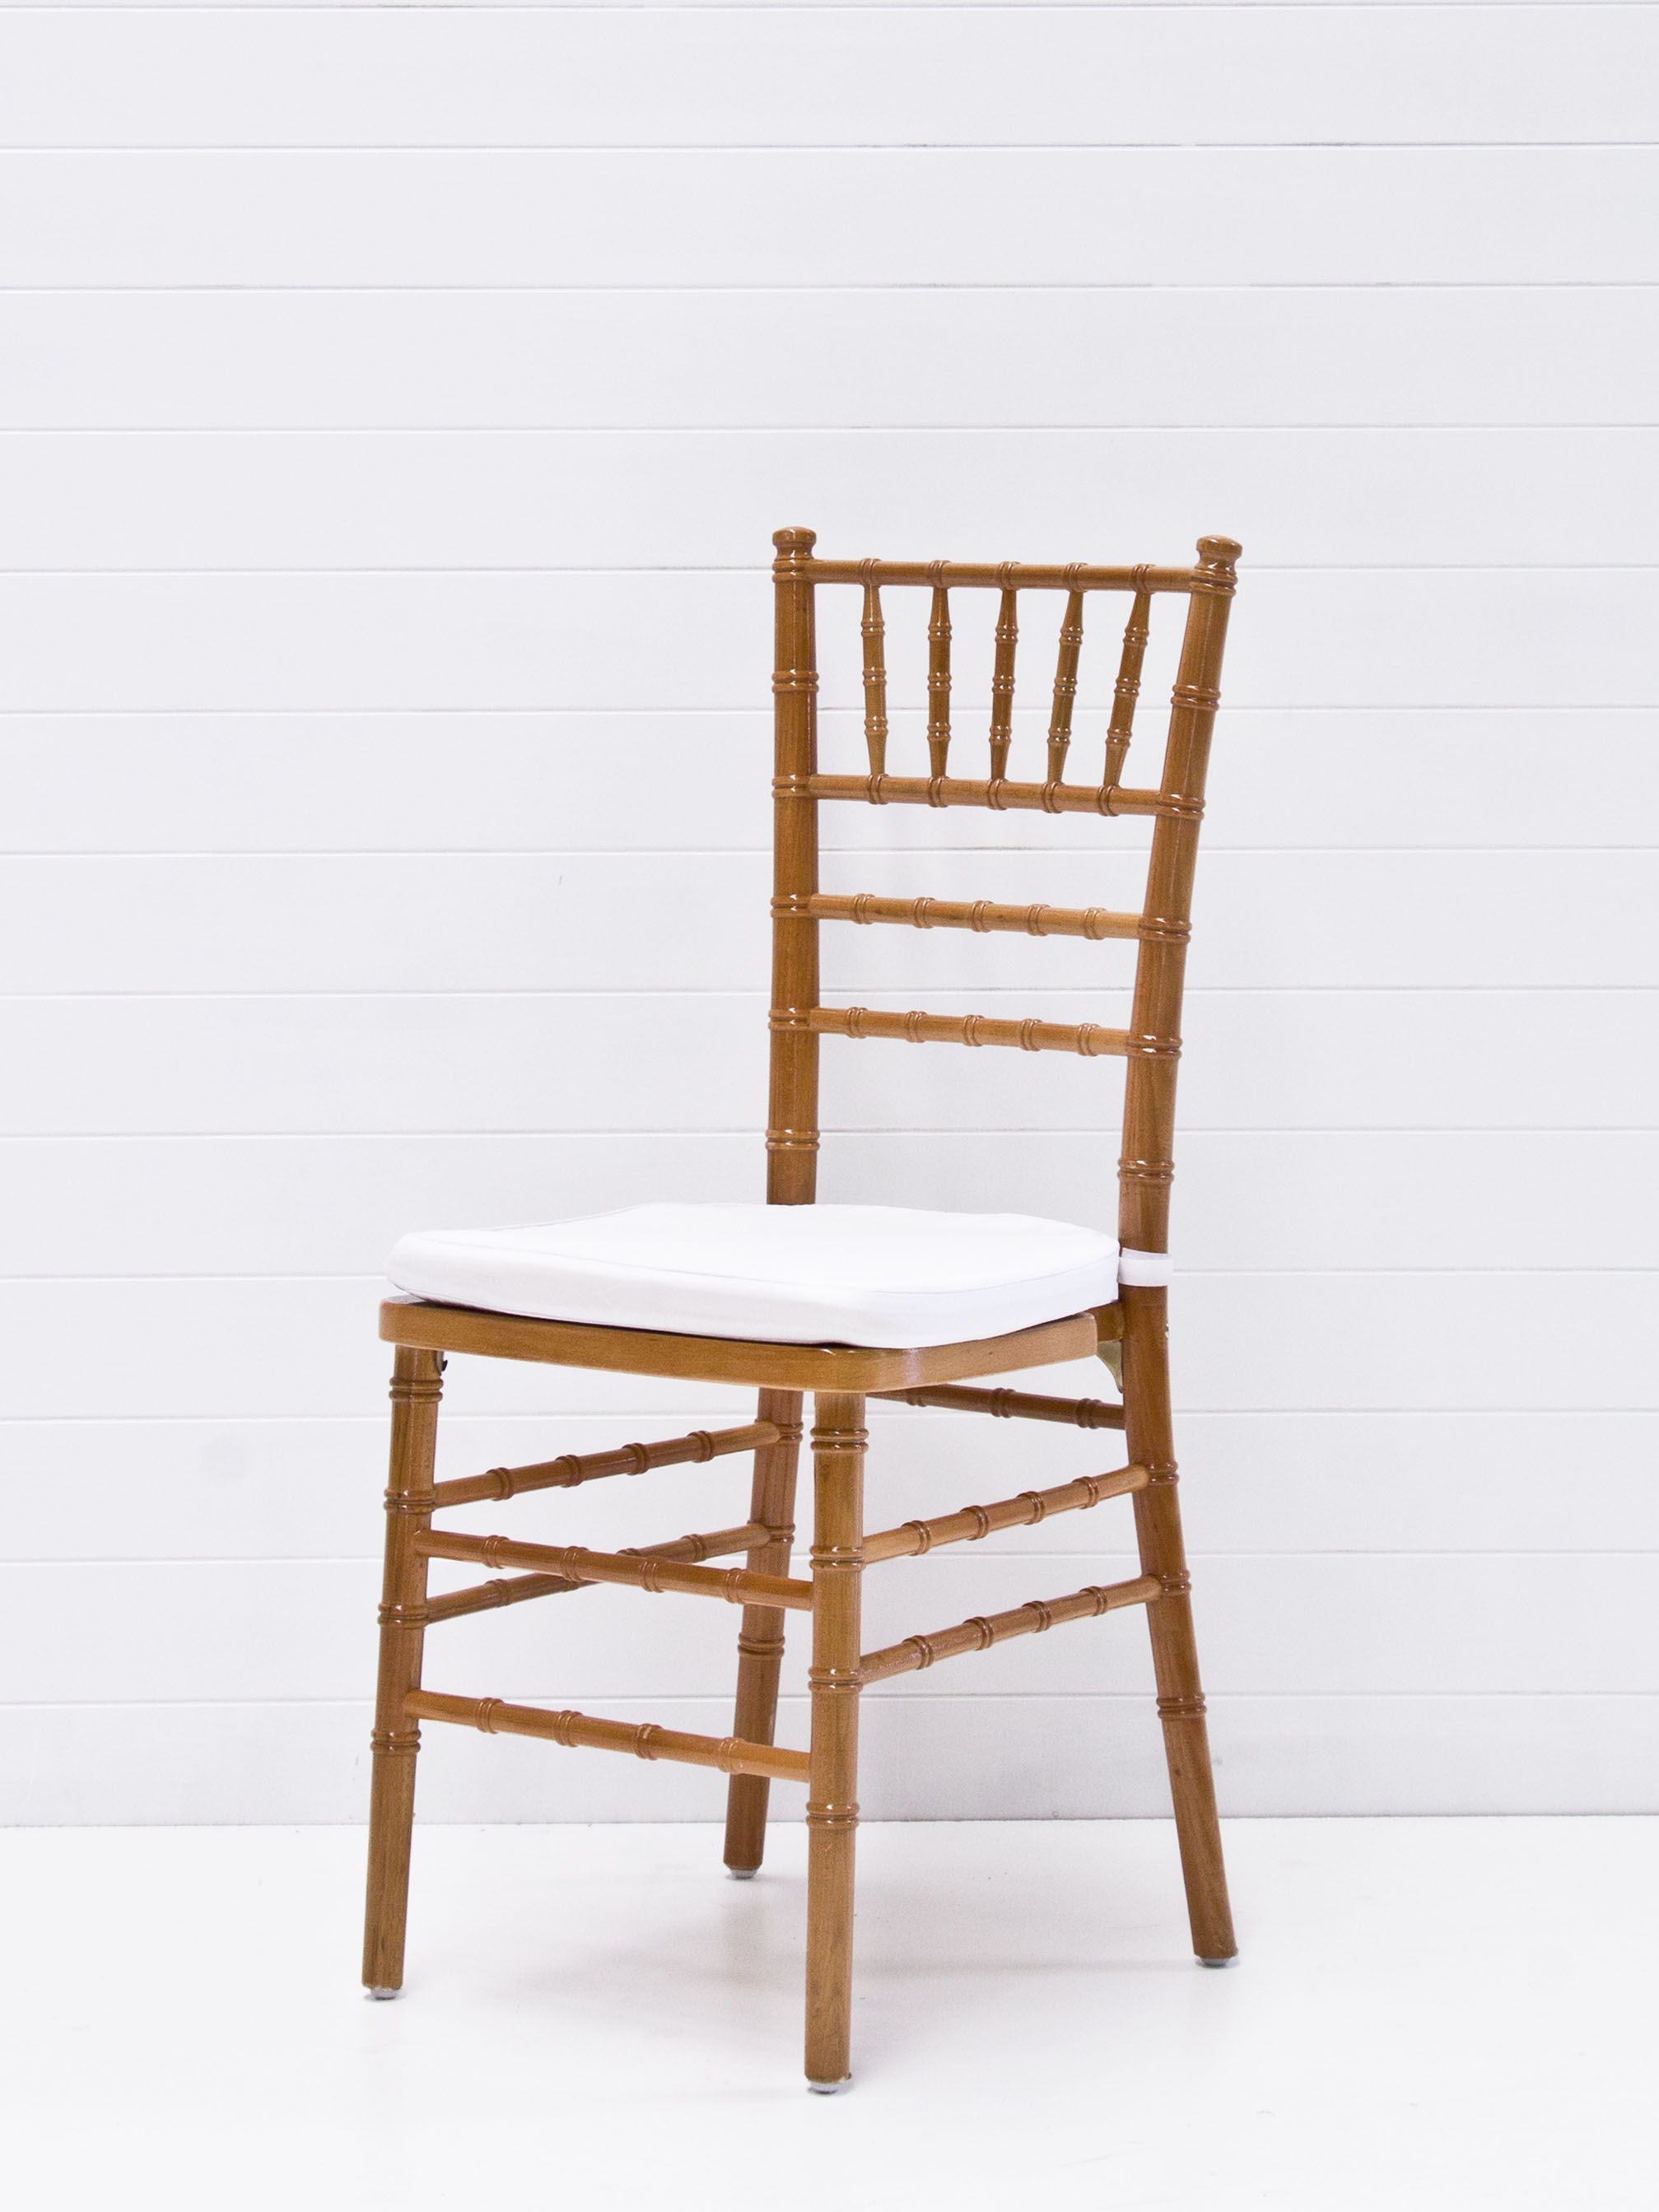 Bamboo tiffany chair.jpg